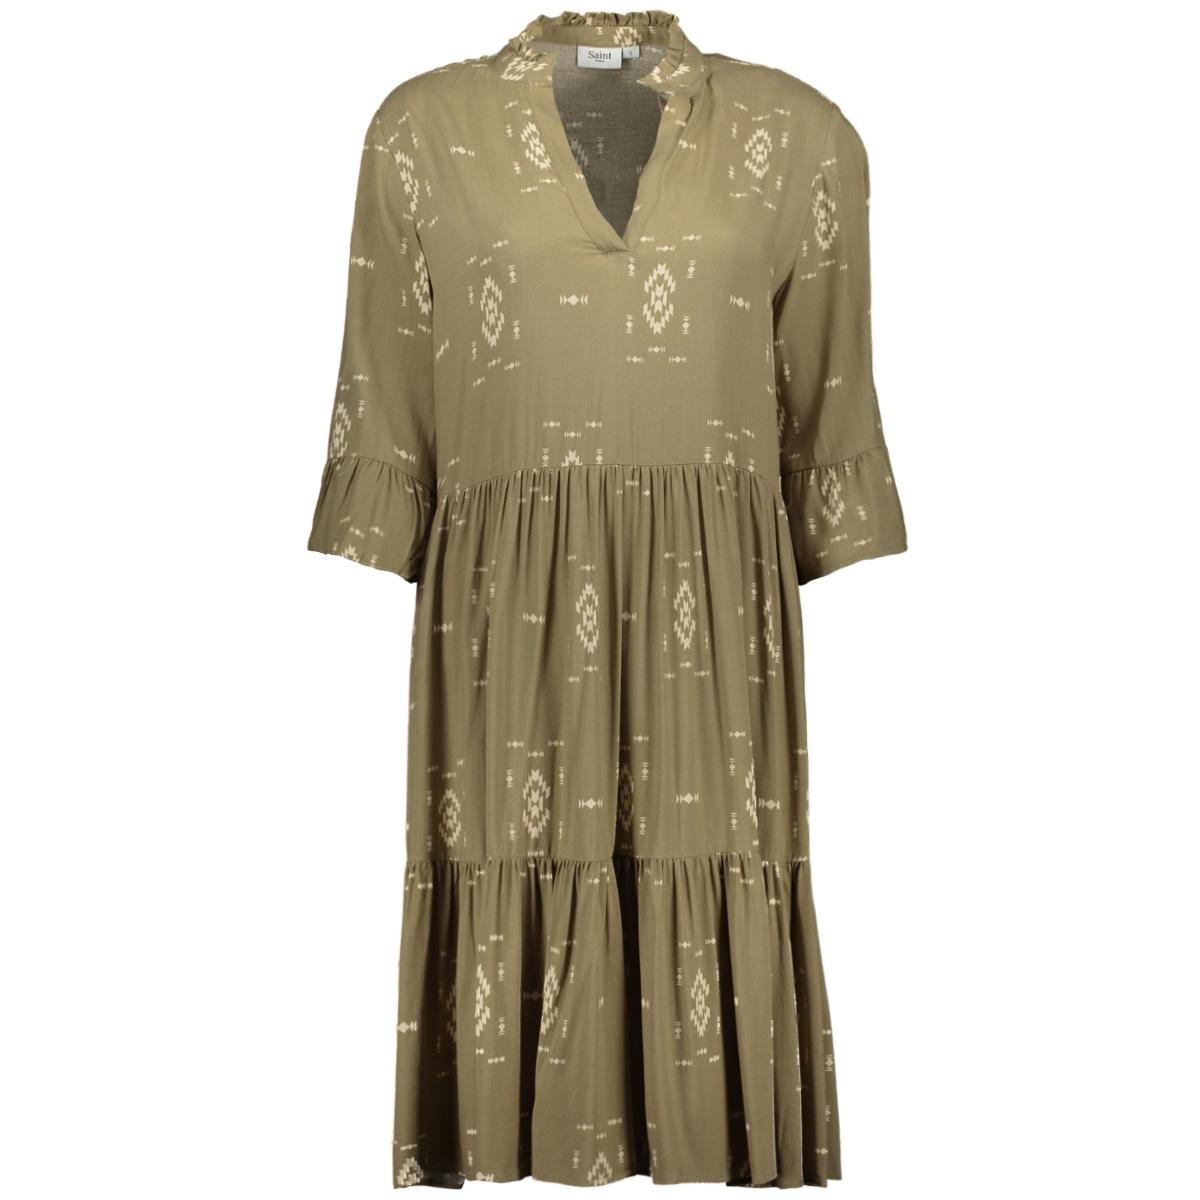 eda dress 30510220 saint tropez jurk 180617 astez covert gree